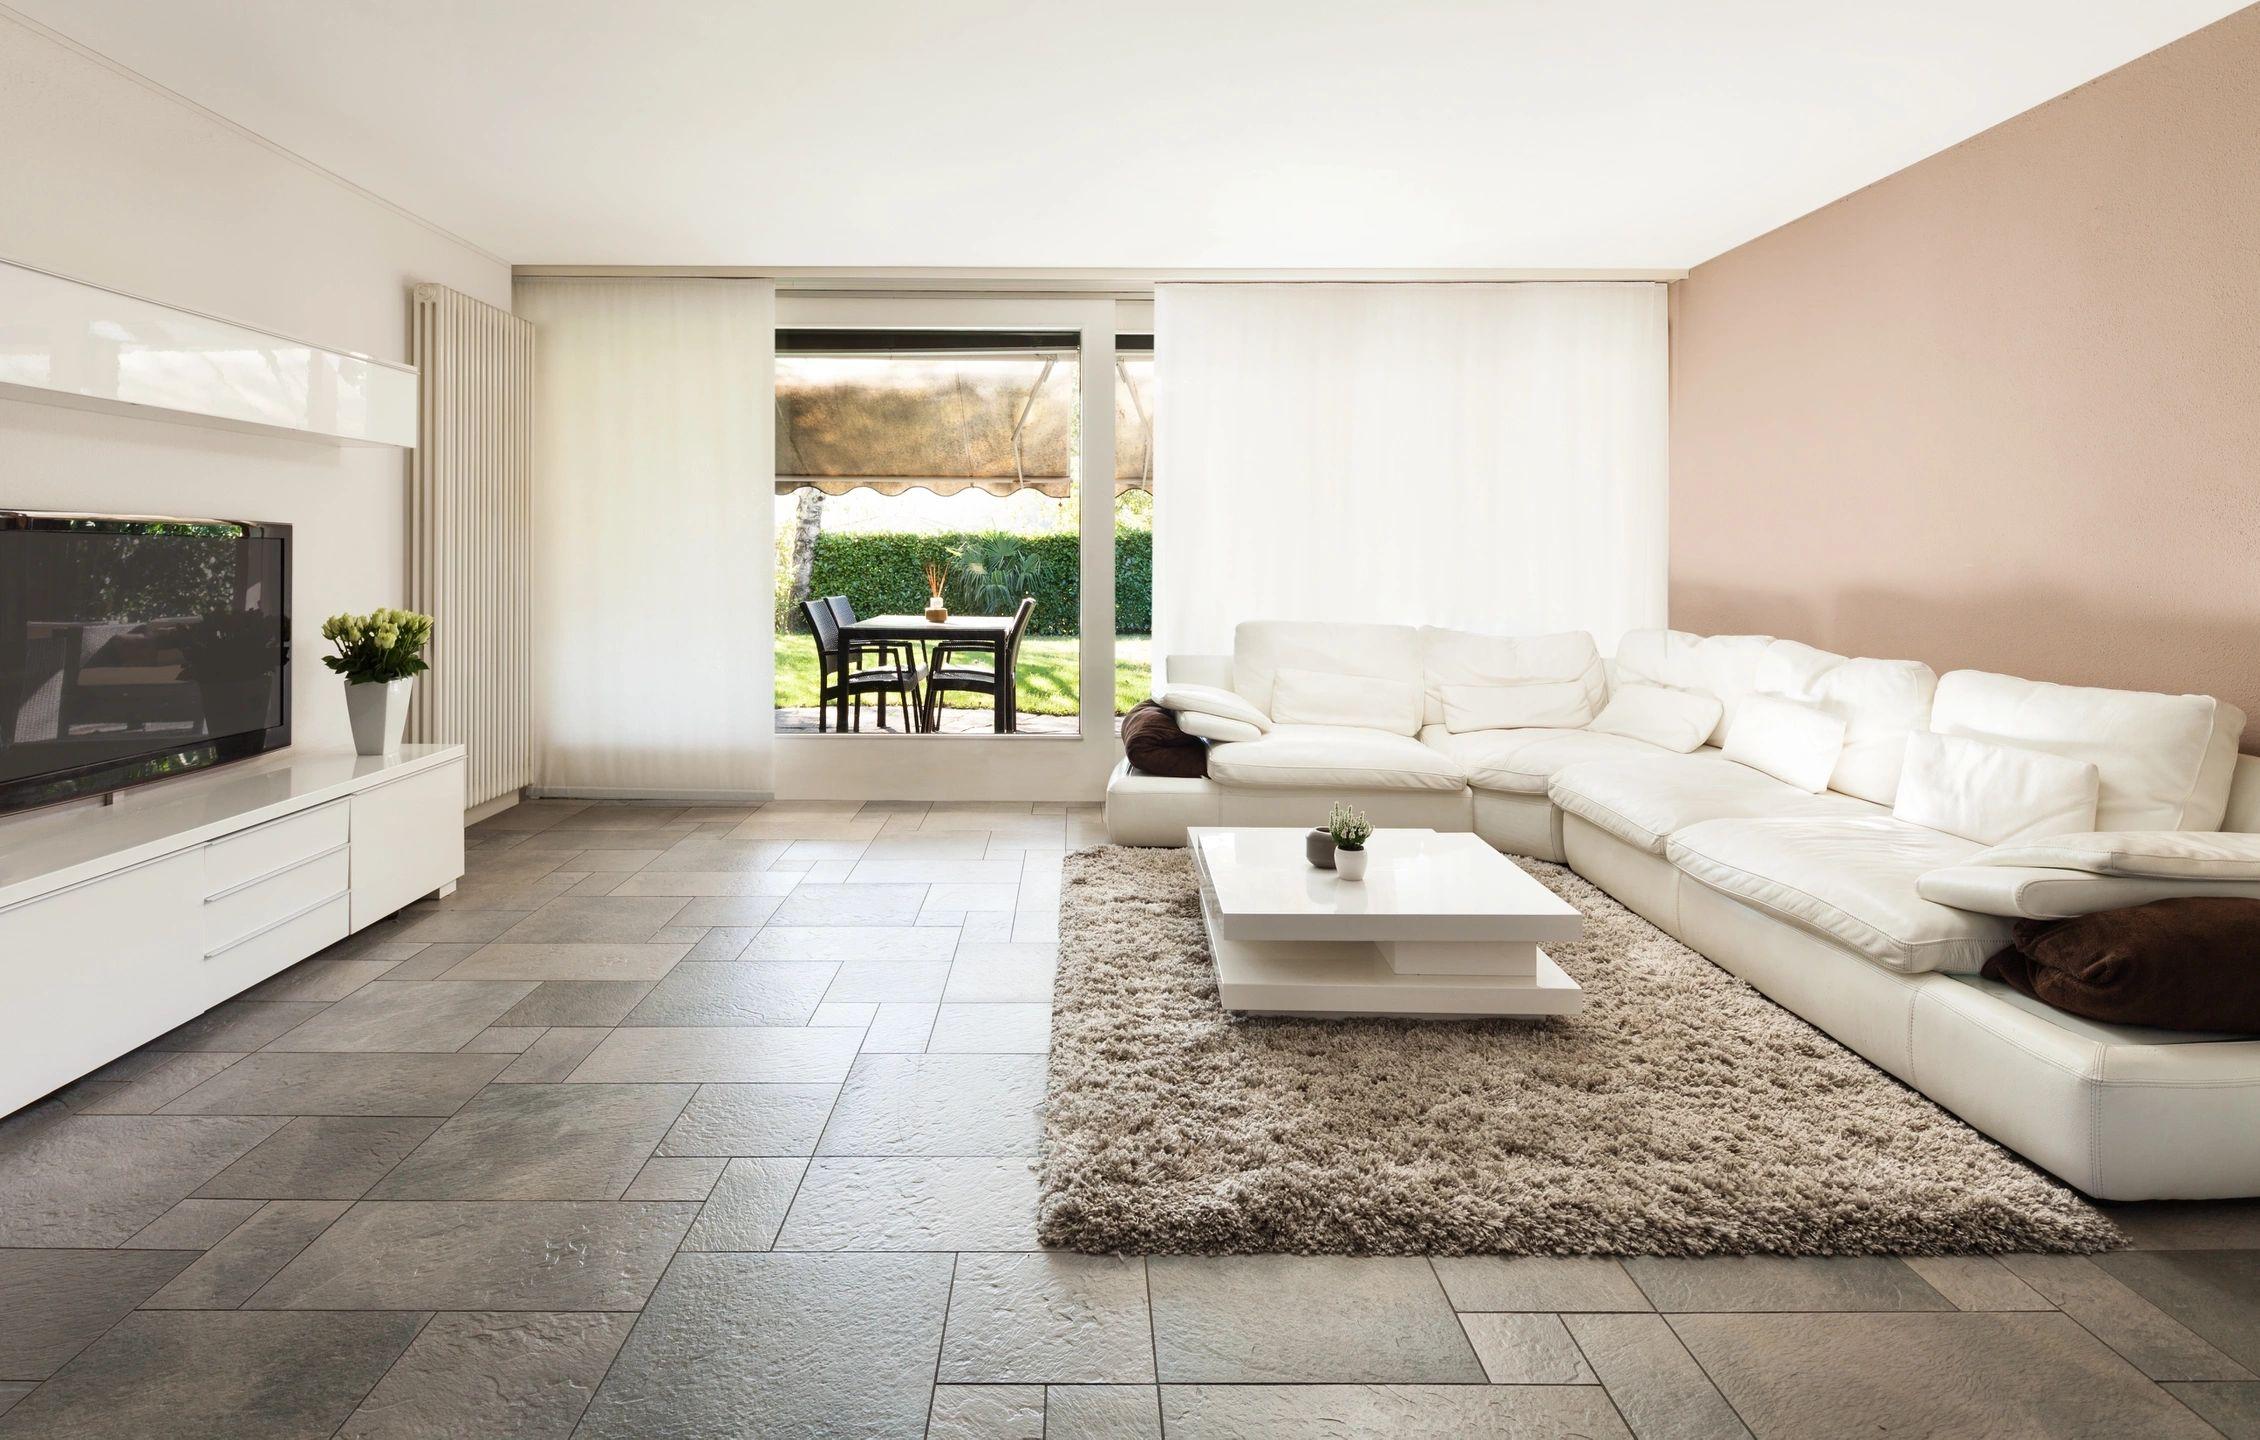 Flooring Distributor and Supplier - Palm Beach County - Best Source Supply - Riviera Beach, FL